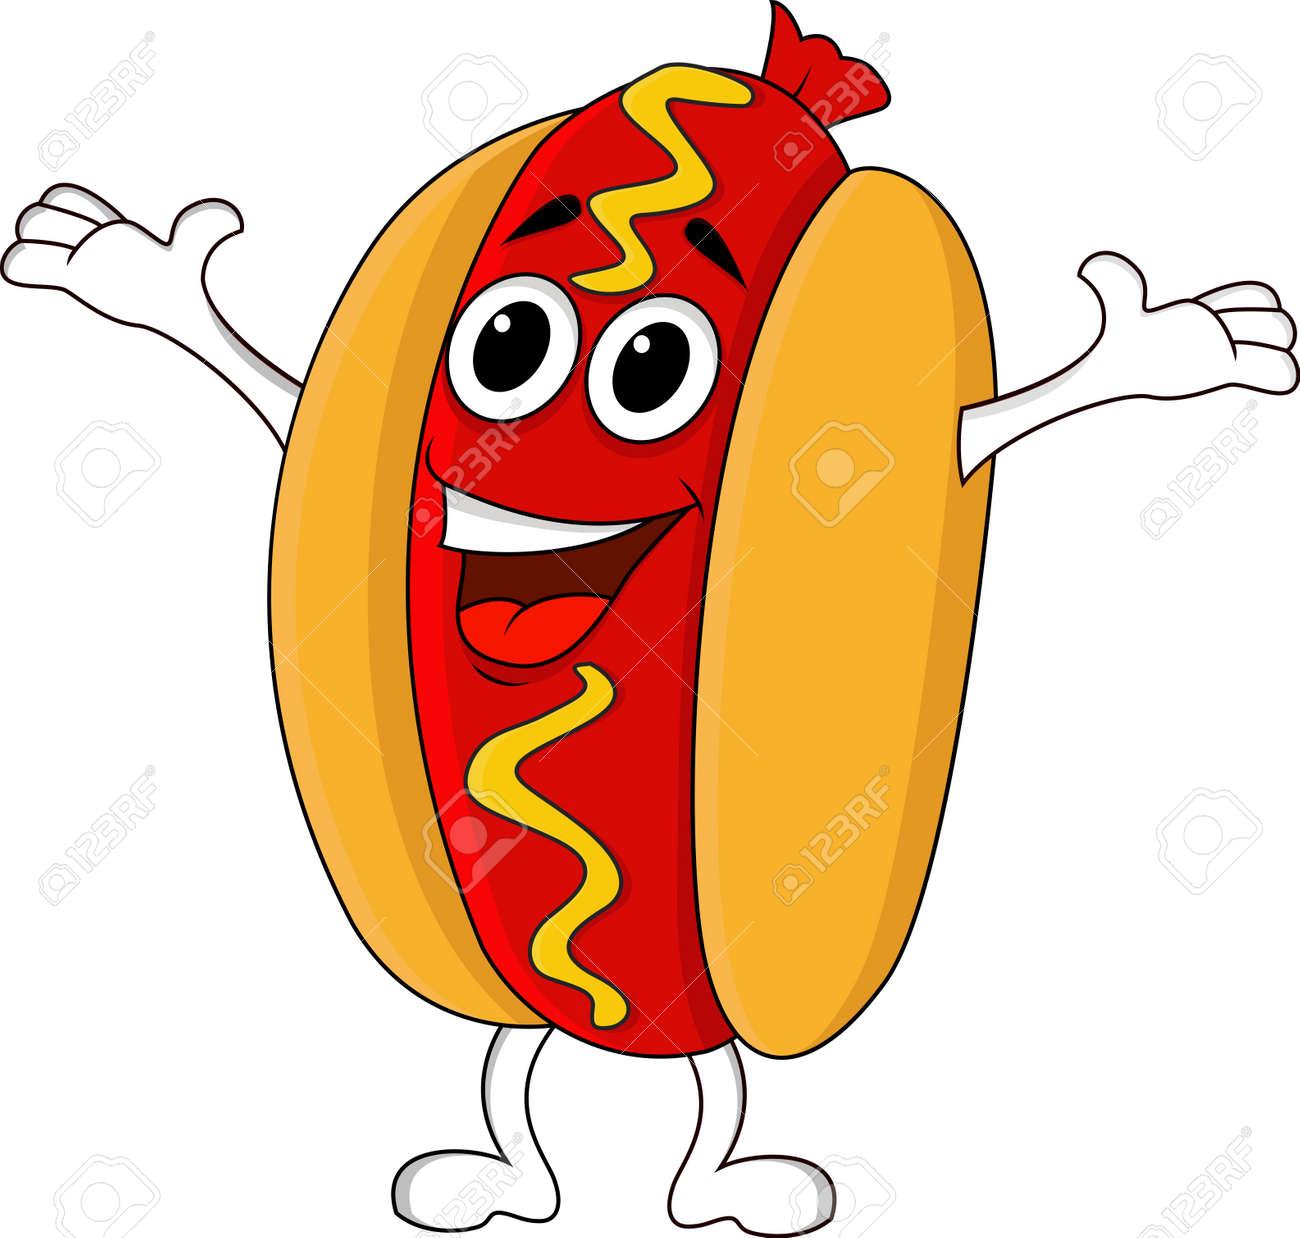 Hot dog cartoon character - 14662180